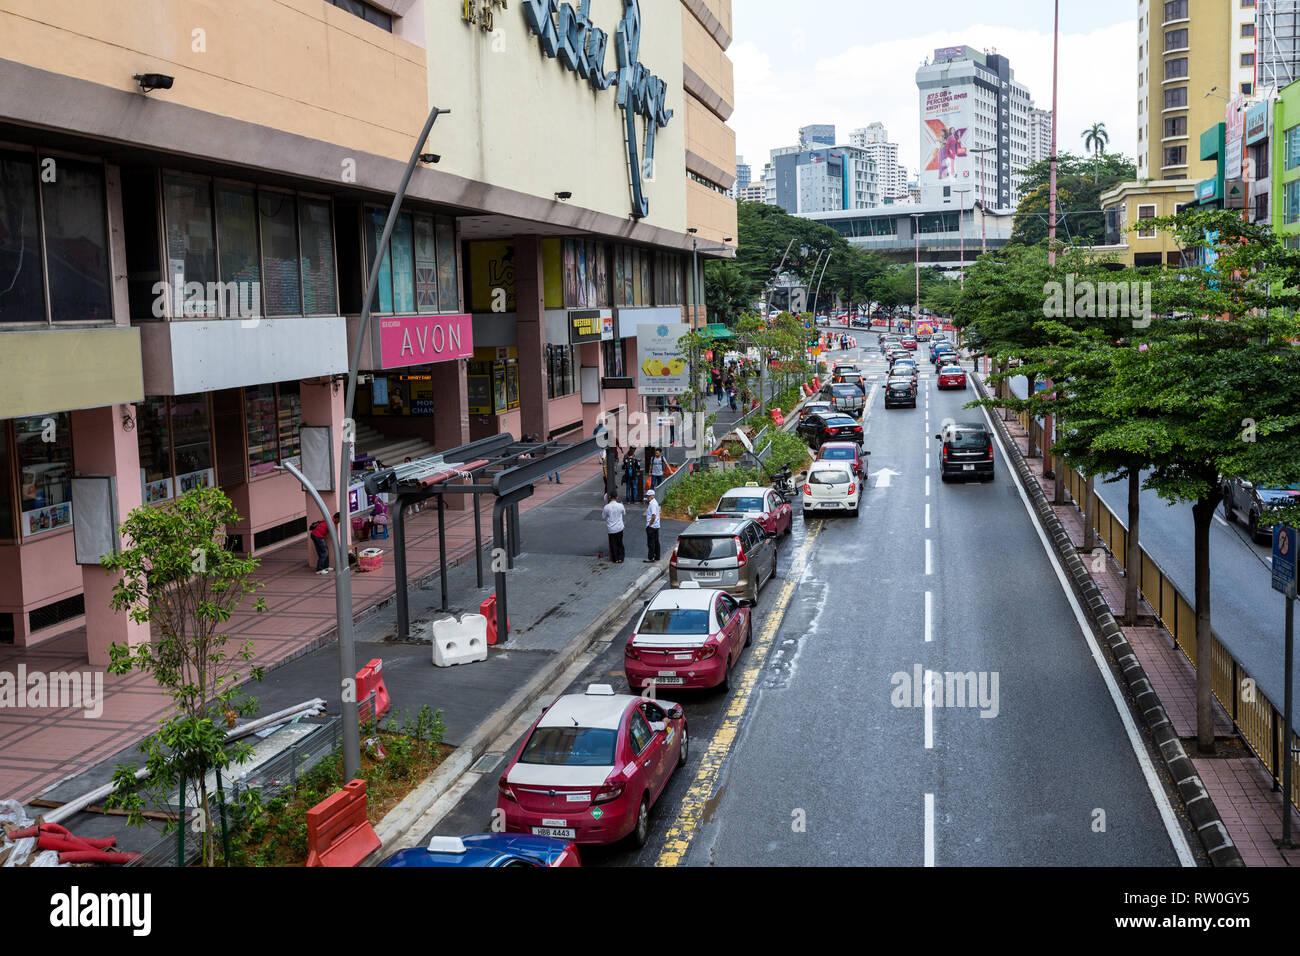 Jalan Tun Tan Cheng Lock Street Scene Kuala Lumpur Malaysia Stock Photo Alamy